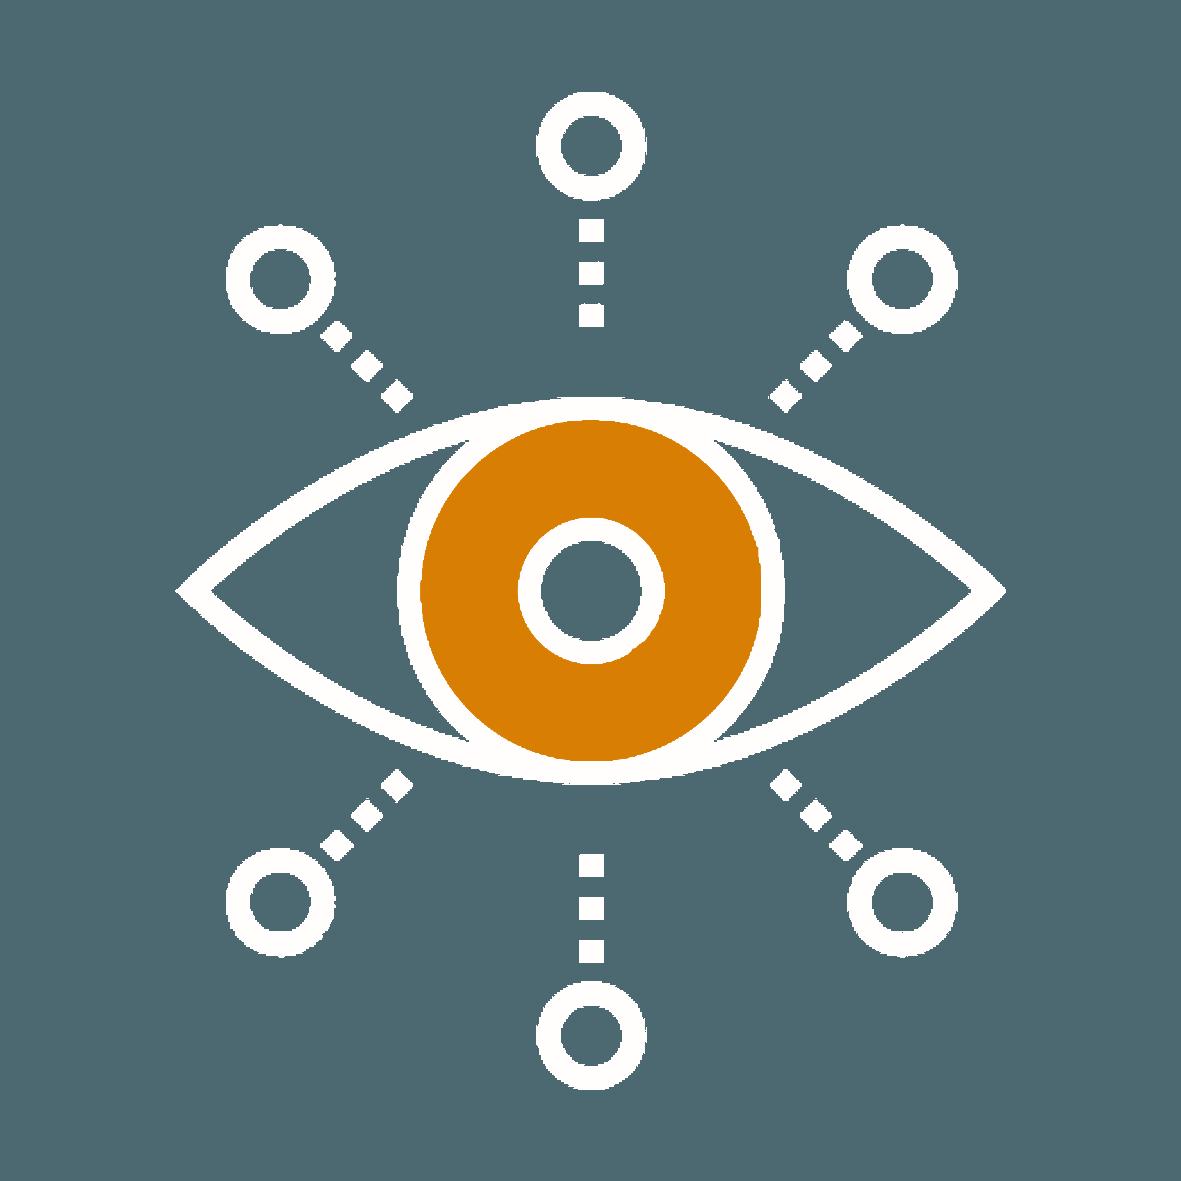 VISAO icon